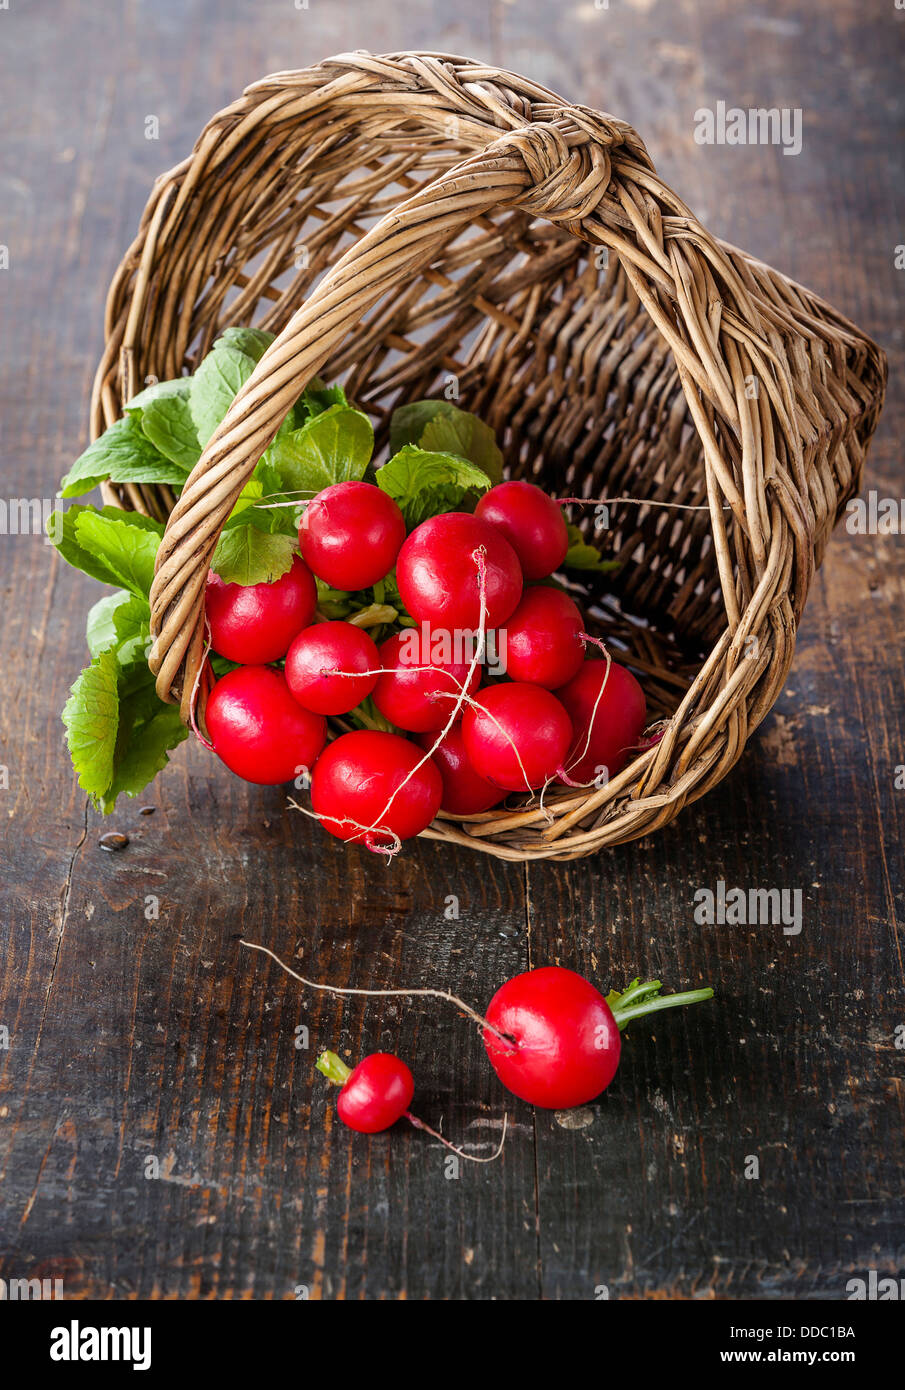 Fresh garden radish in wicker basket on wooden background - Stock Image